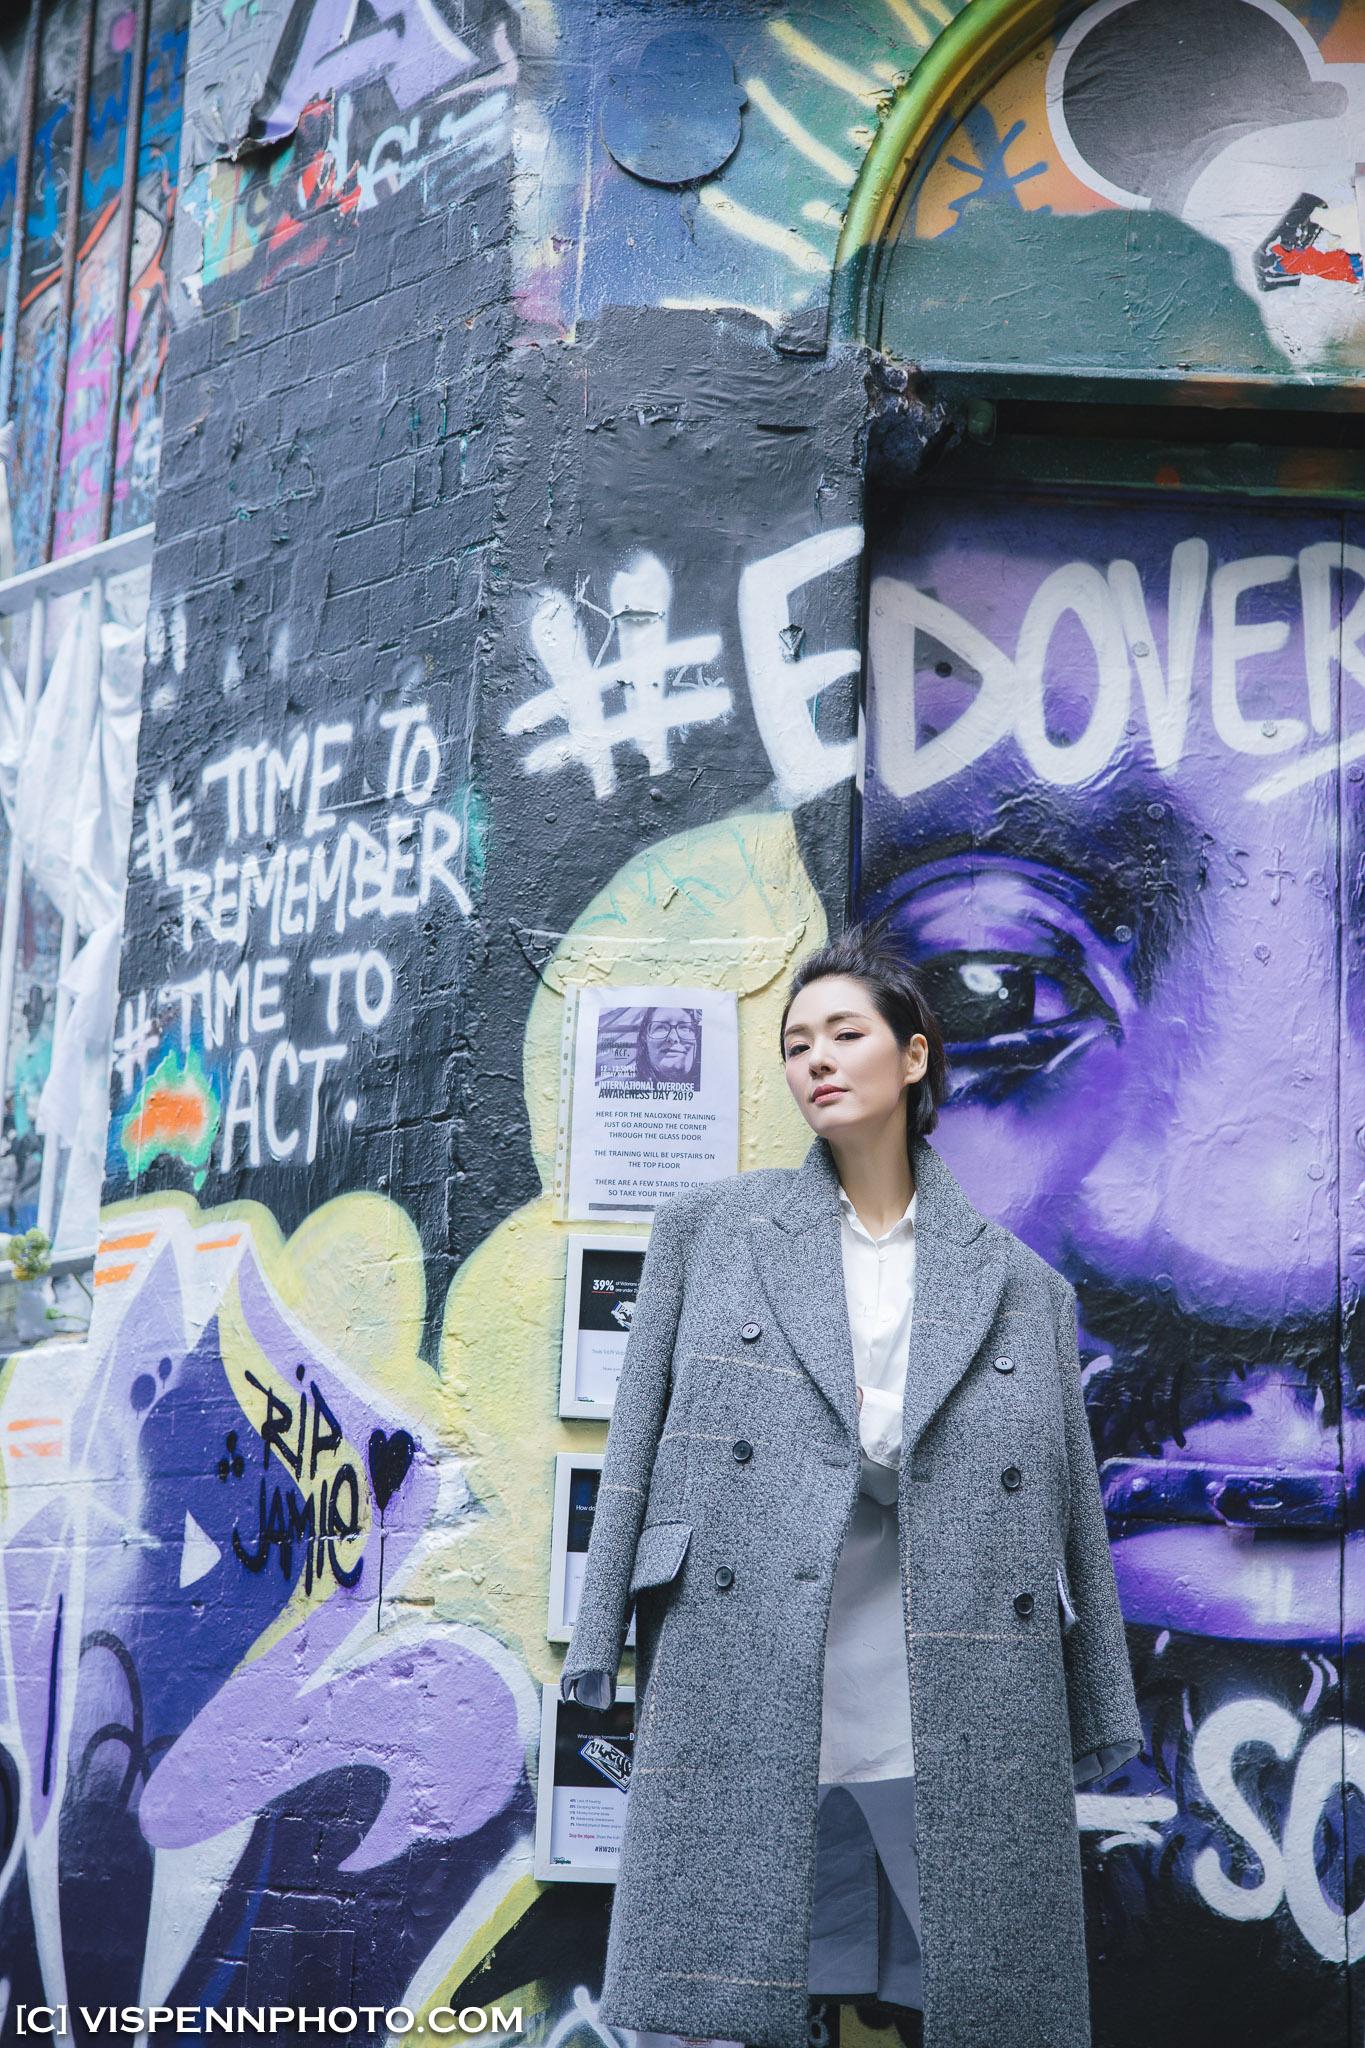 Melbourne Fashion Portrait Commercial Photography VISPENN 墨尔本 服装 商业 人像 摄影 MFW2A 1P 00721 EOSR VISPENN